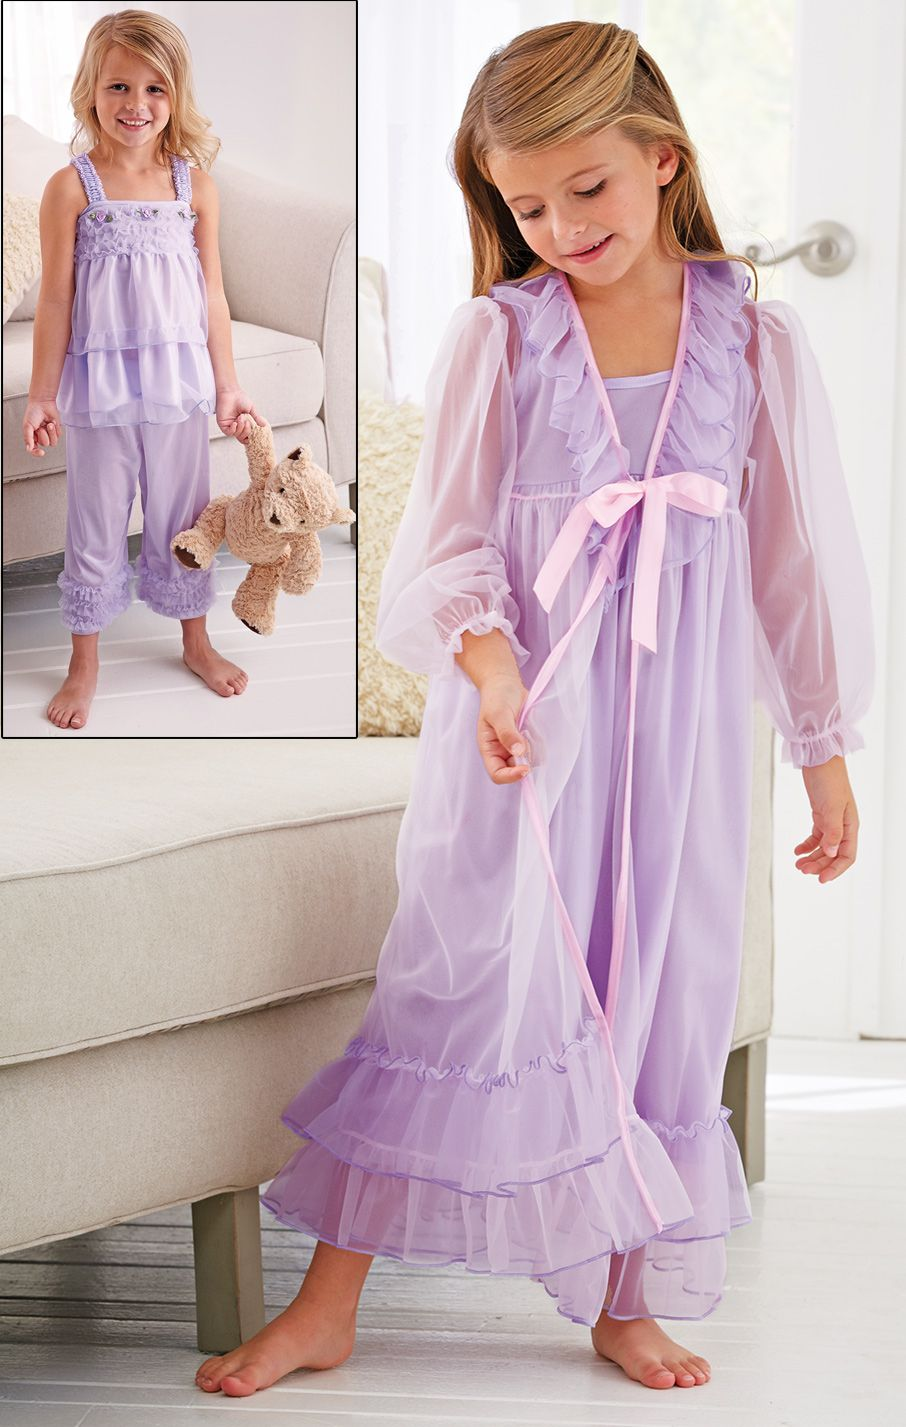 bfaf825075 From CWDkids  Frilly Bo Peep Pajamas   Ruffle Peignoir Set-This is beyond  adorable!